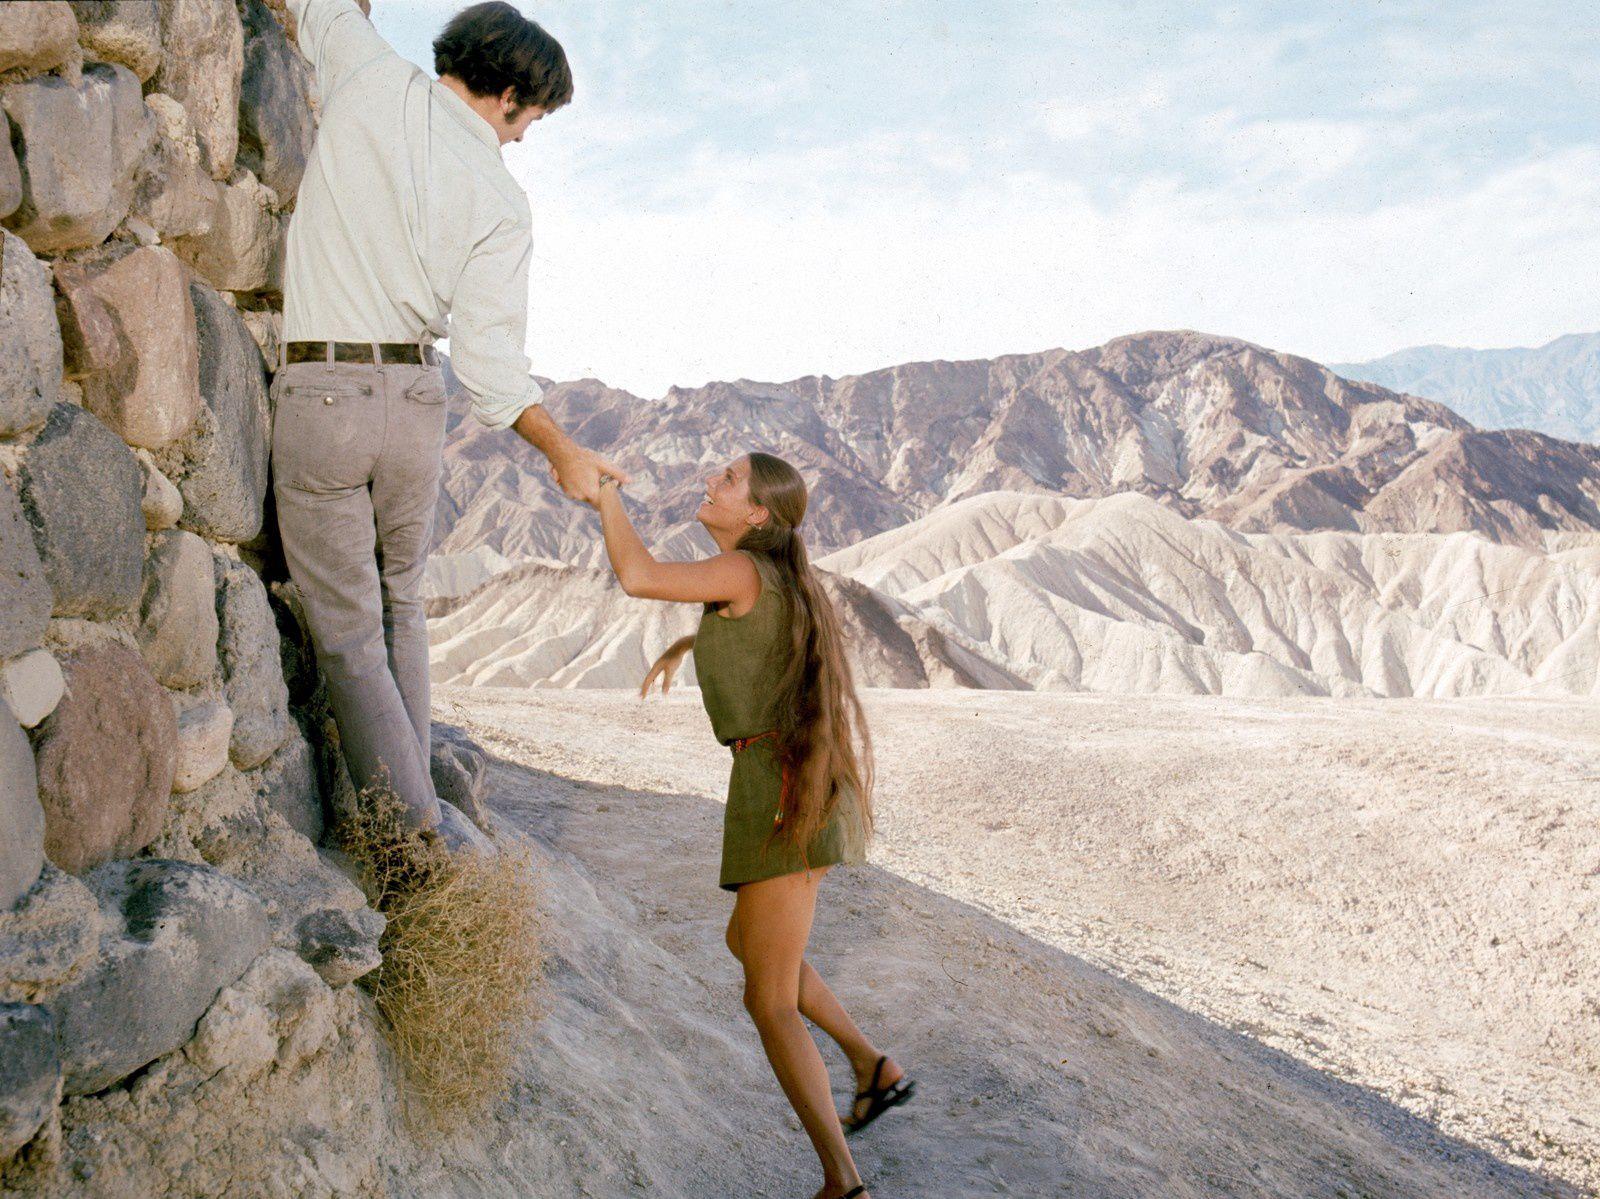 Zabriskie Point (1970) Michelangelo Antonioni